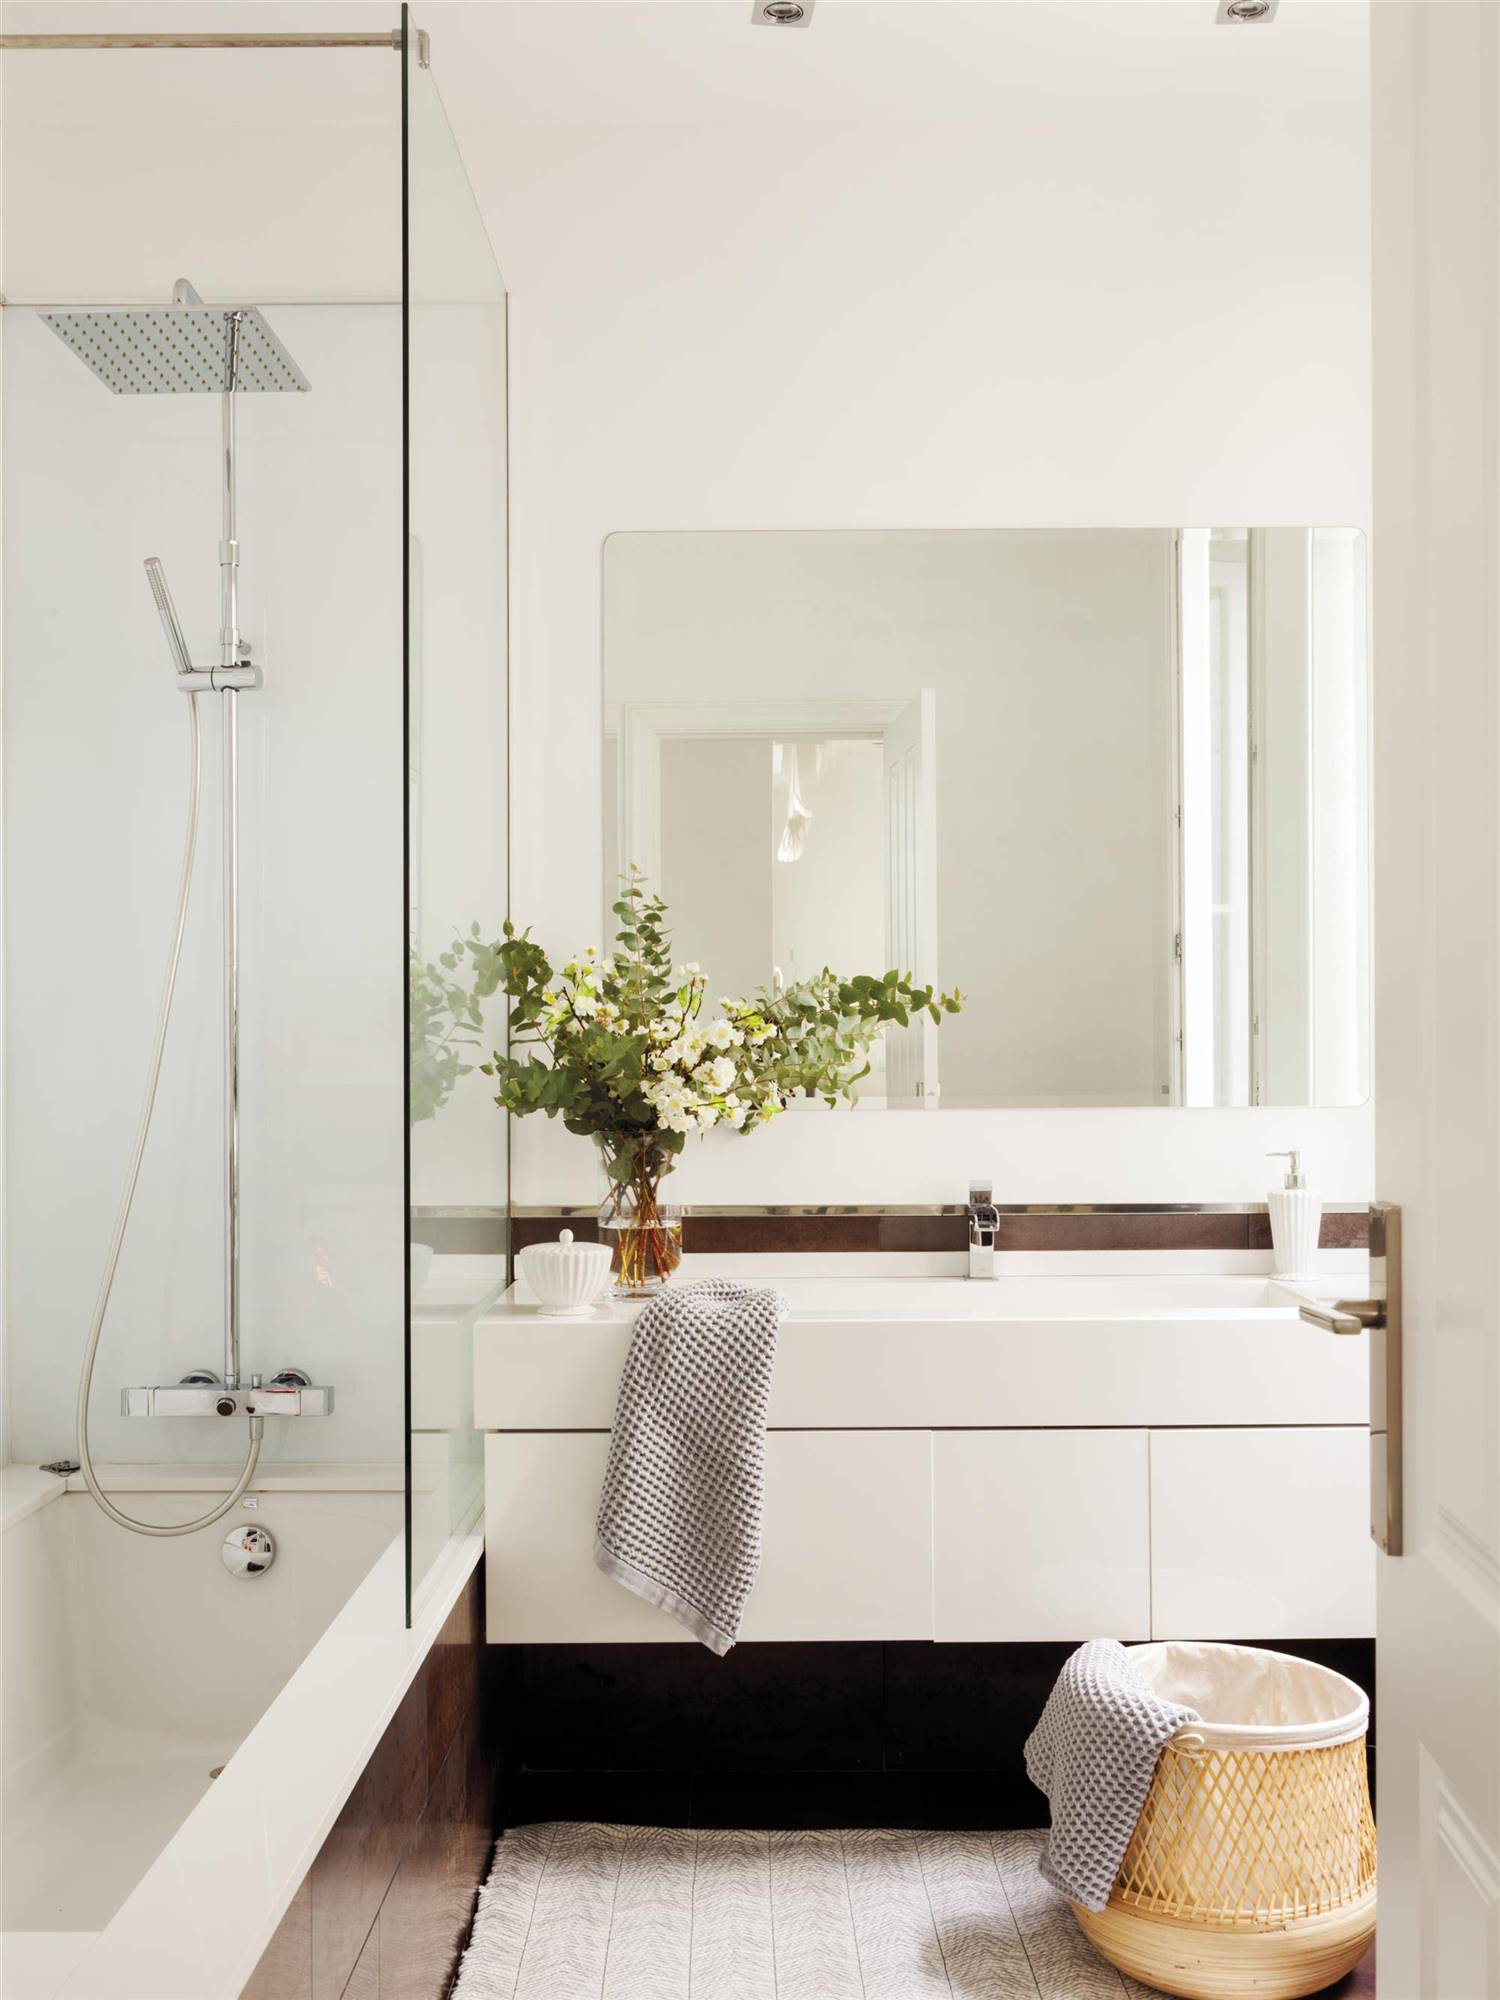 Cómo iluminar un baño sin ventana